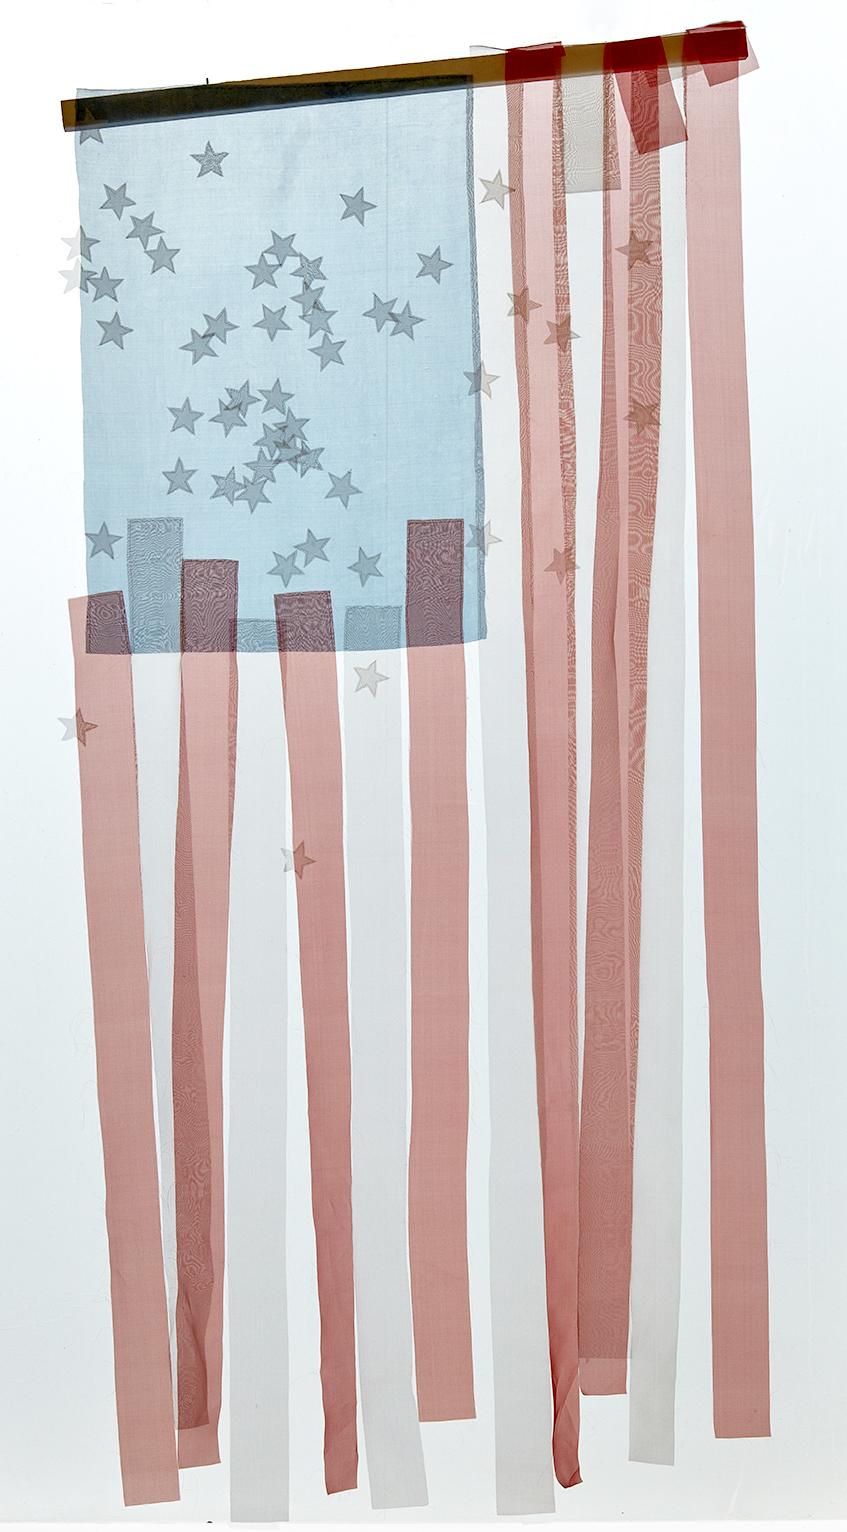 George Stoll, Untitled (dropped American flag #4), 2017 silk organza, silk thread, felt, plywood and paint 261,6 x 109 cm - 103 x 43 inches